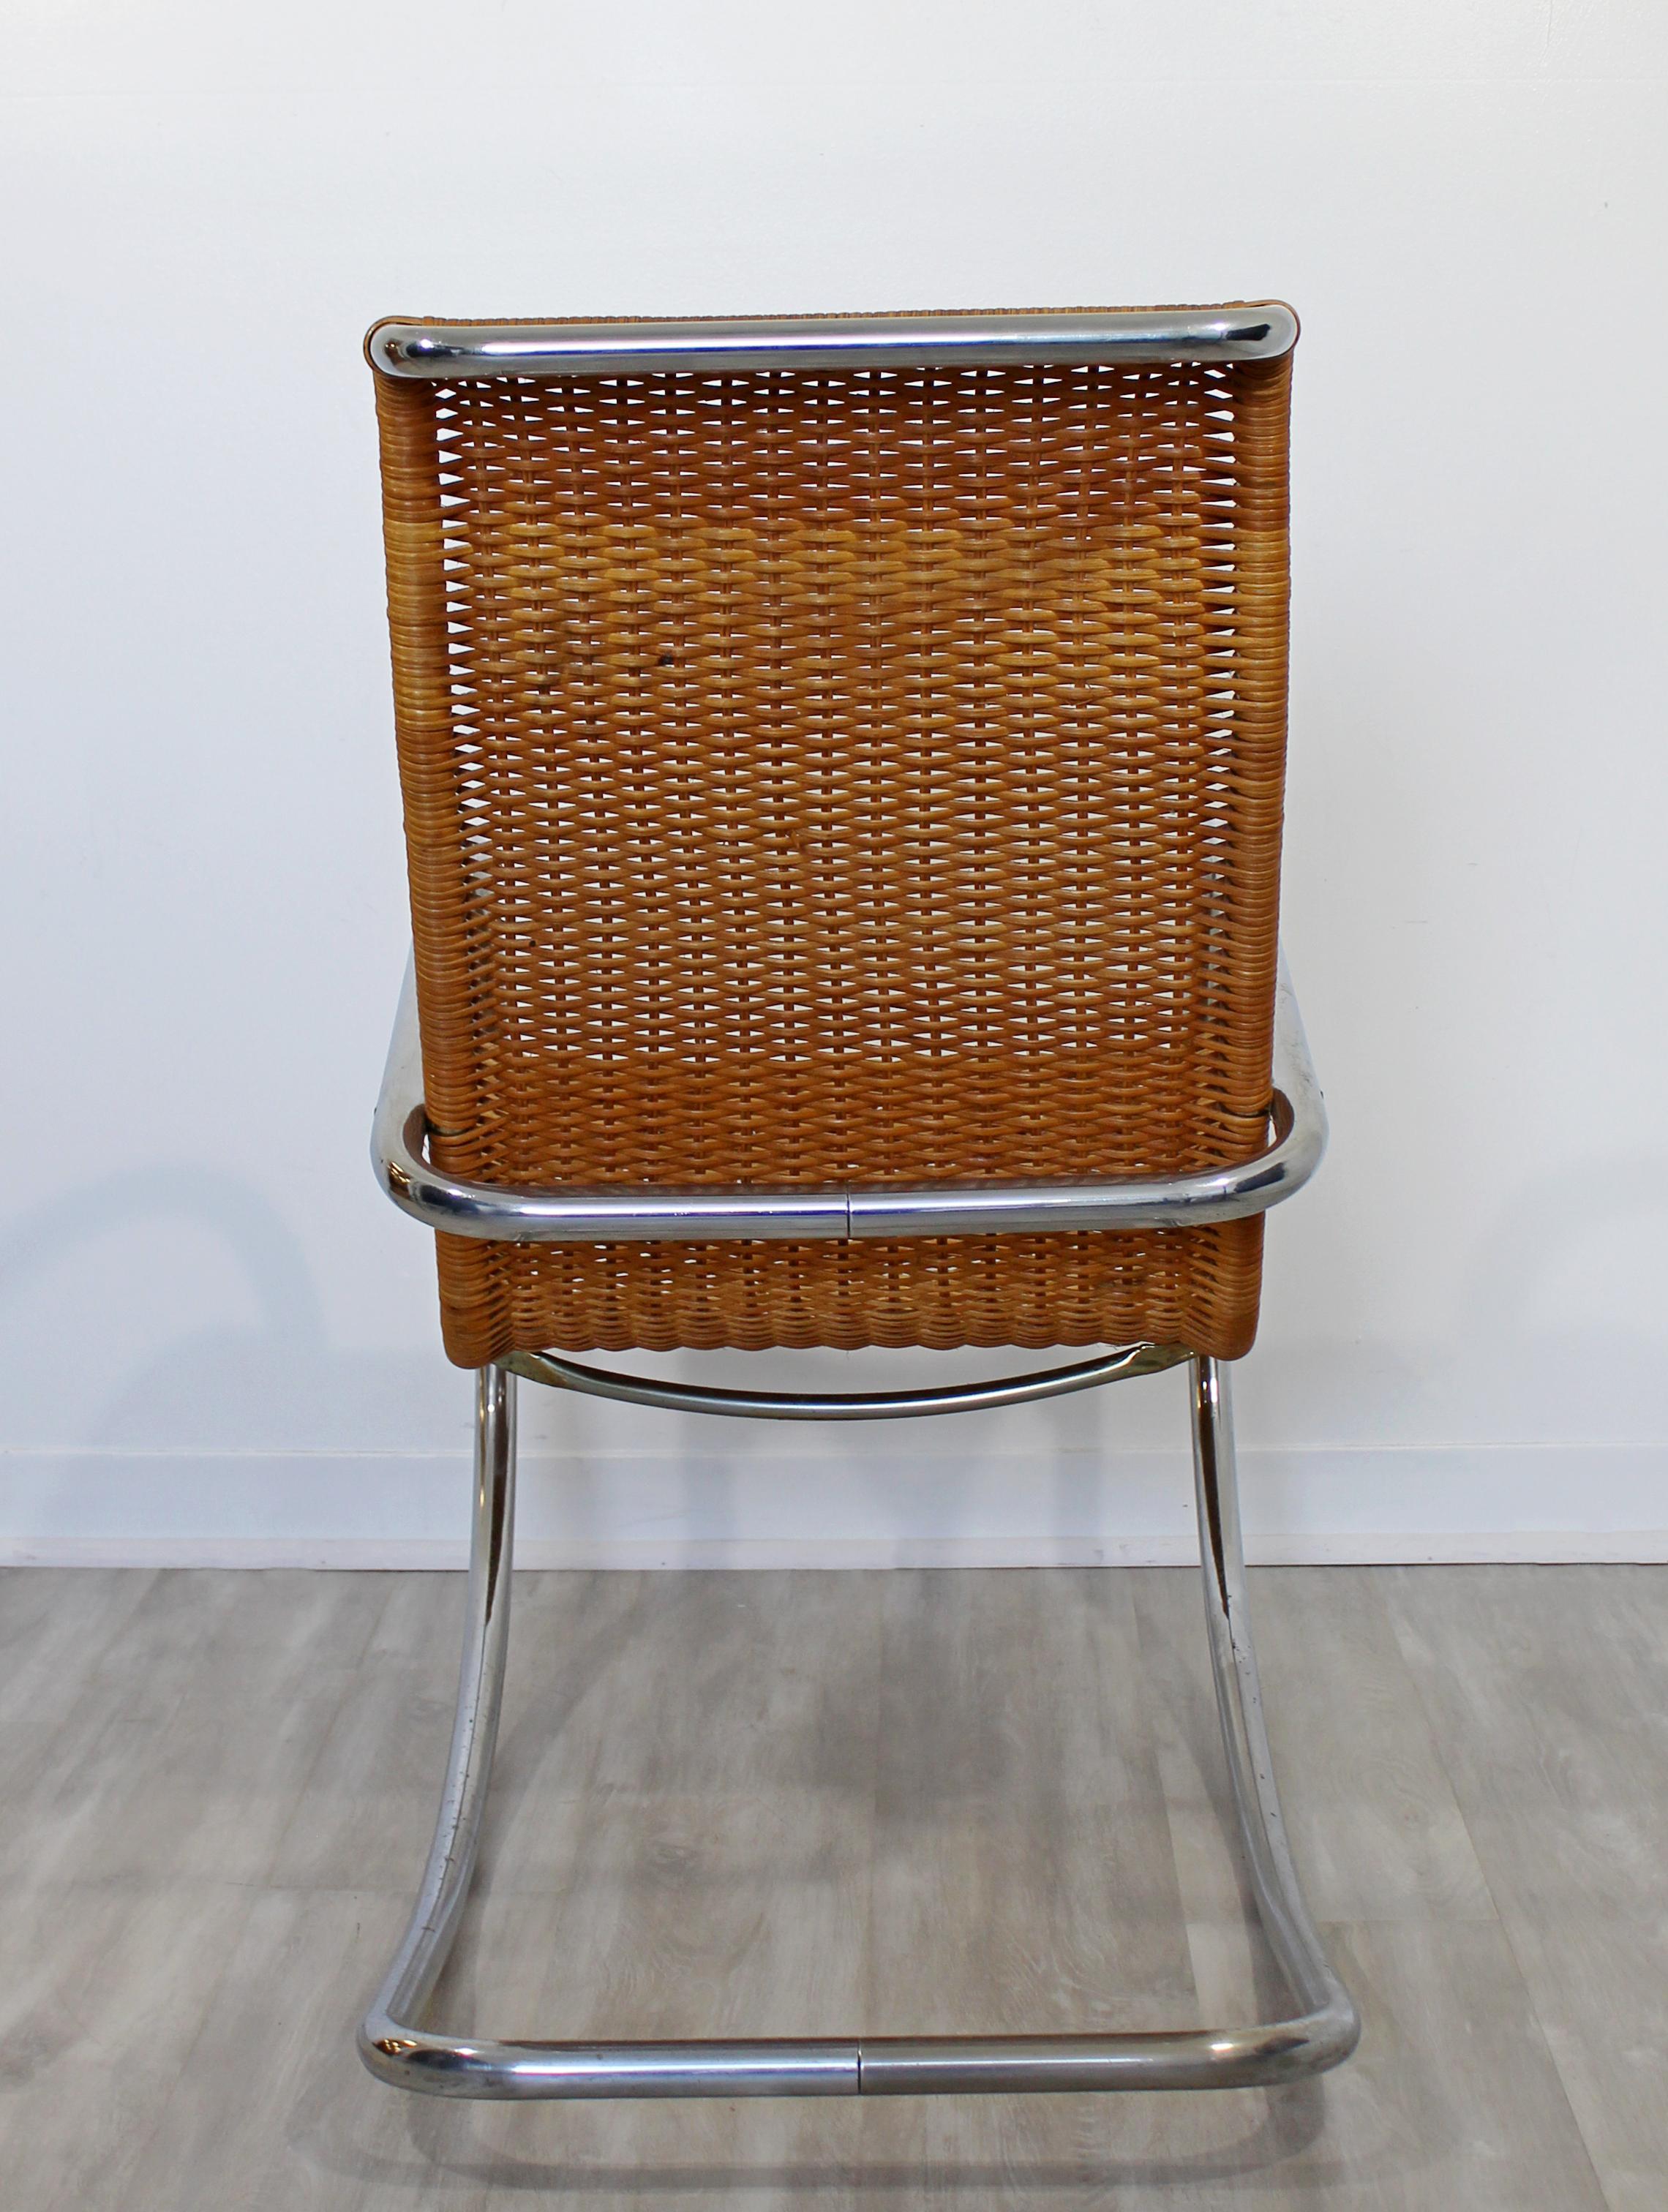 Superb Mid Century Modern Italian Rattan Tubular Chrome Rocker Rocking Chair Italy Beatyapartments Chair Design Images Beatyapartmentscom